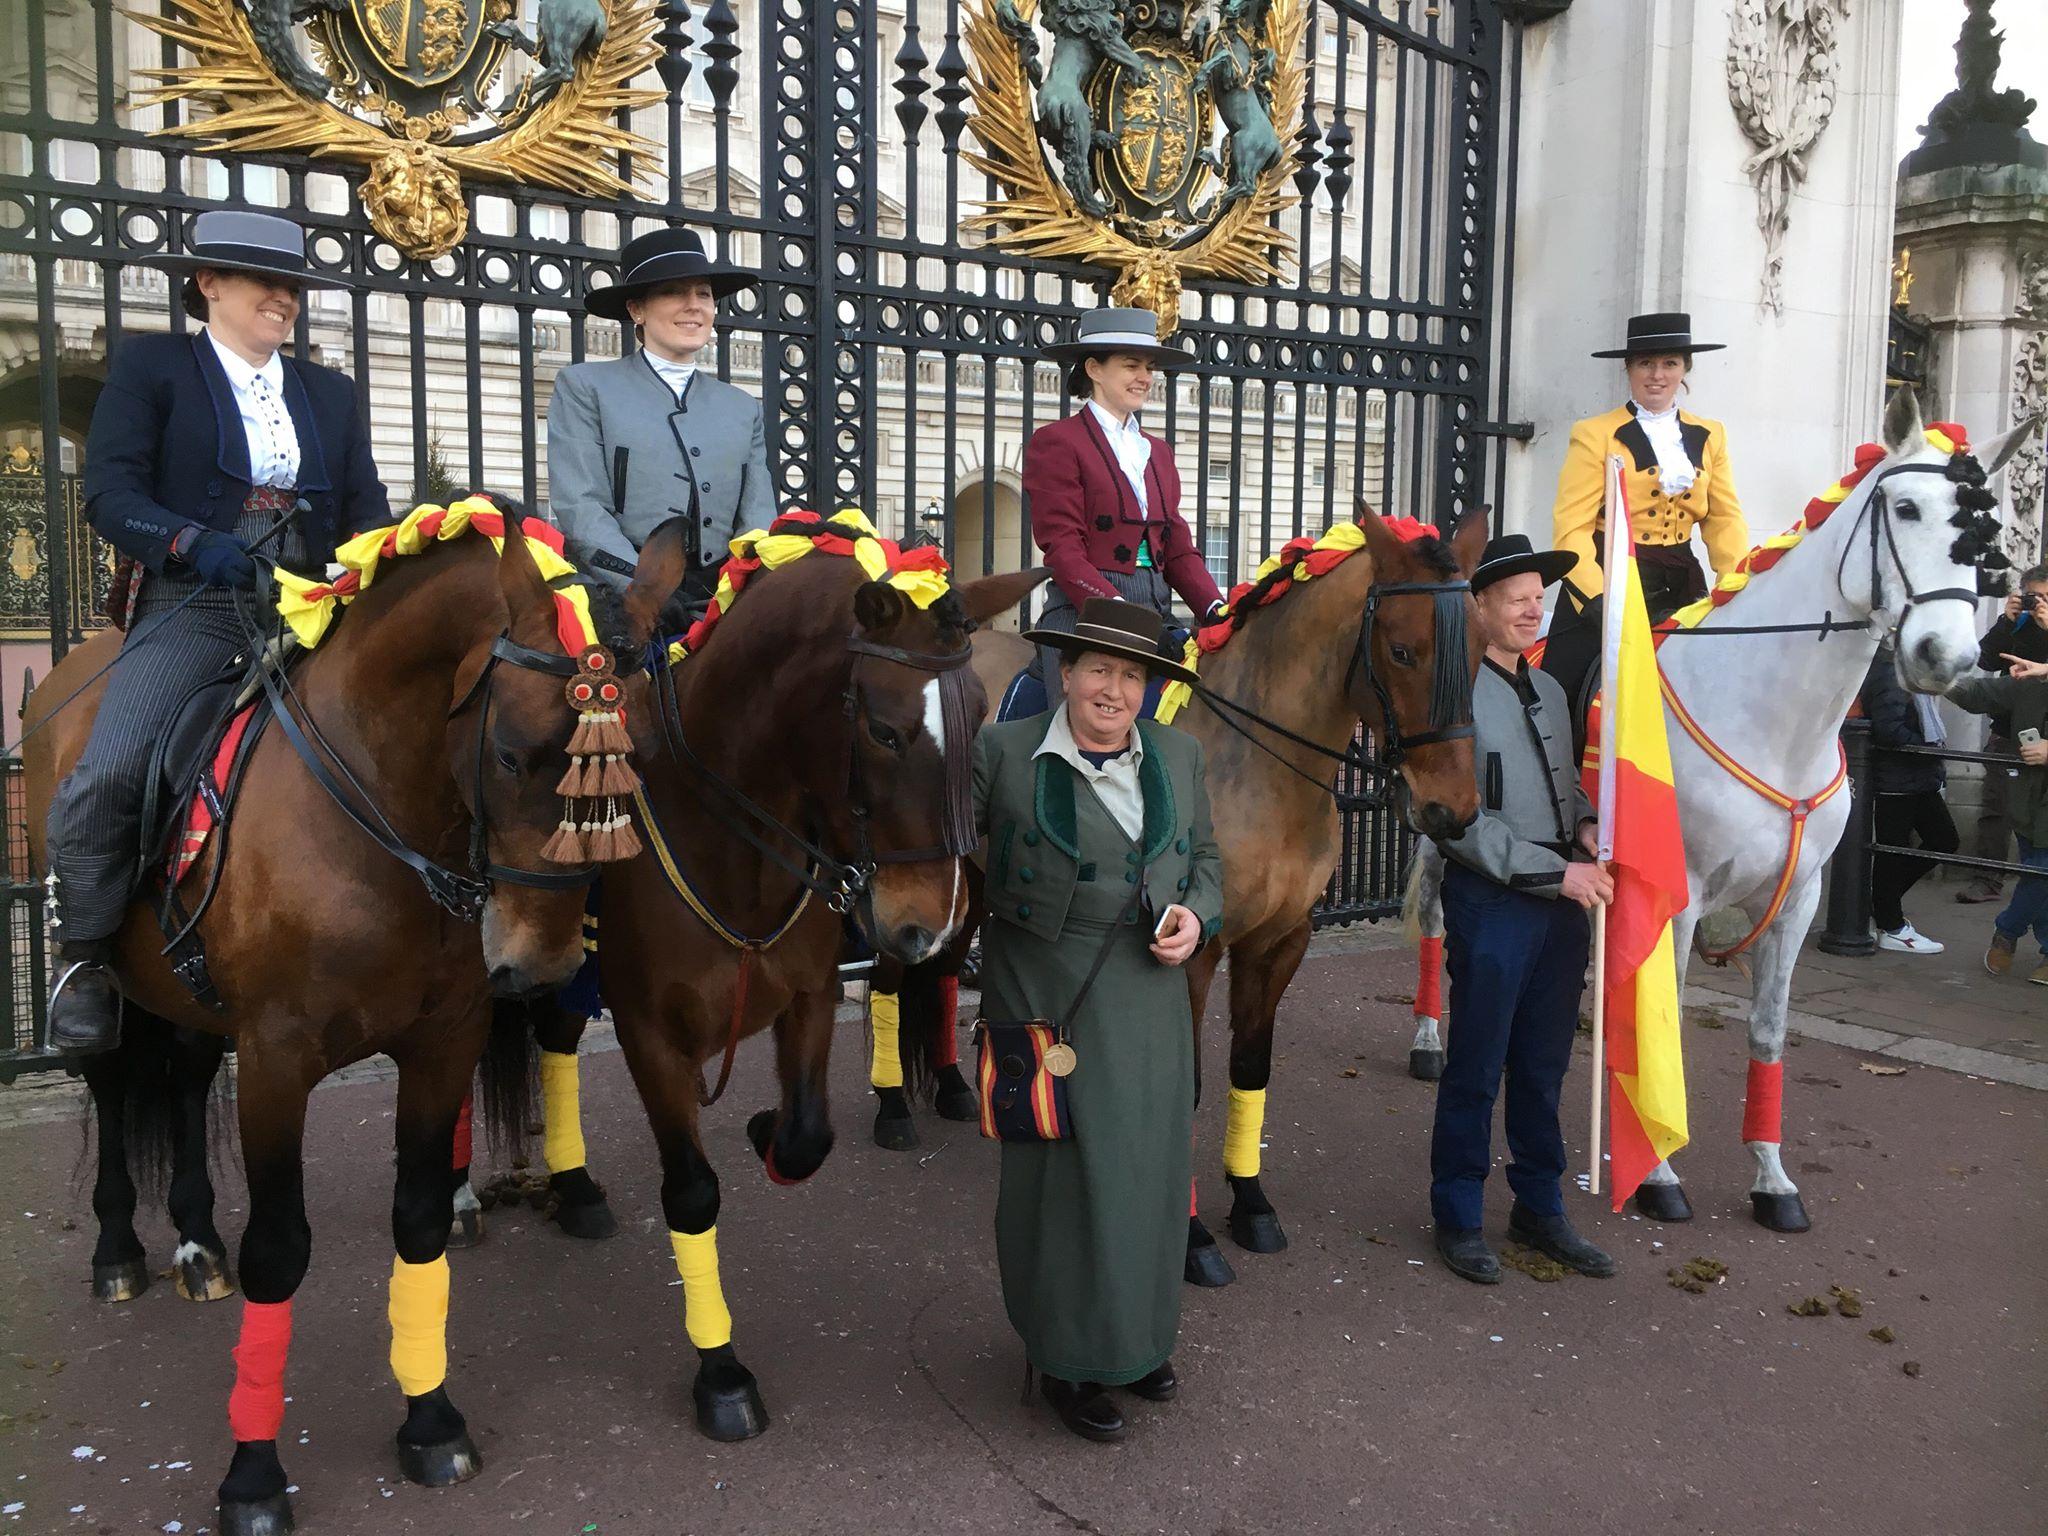 New Years Parade 2019 Buckingham Palace